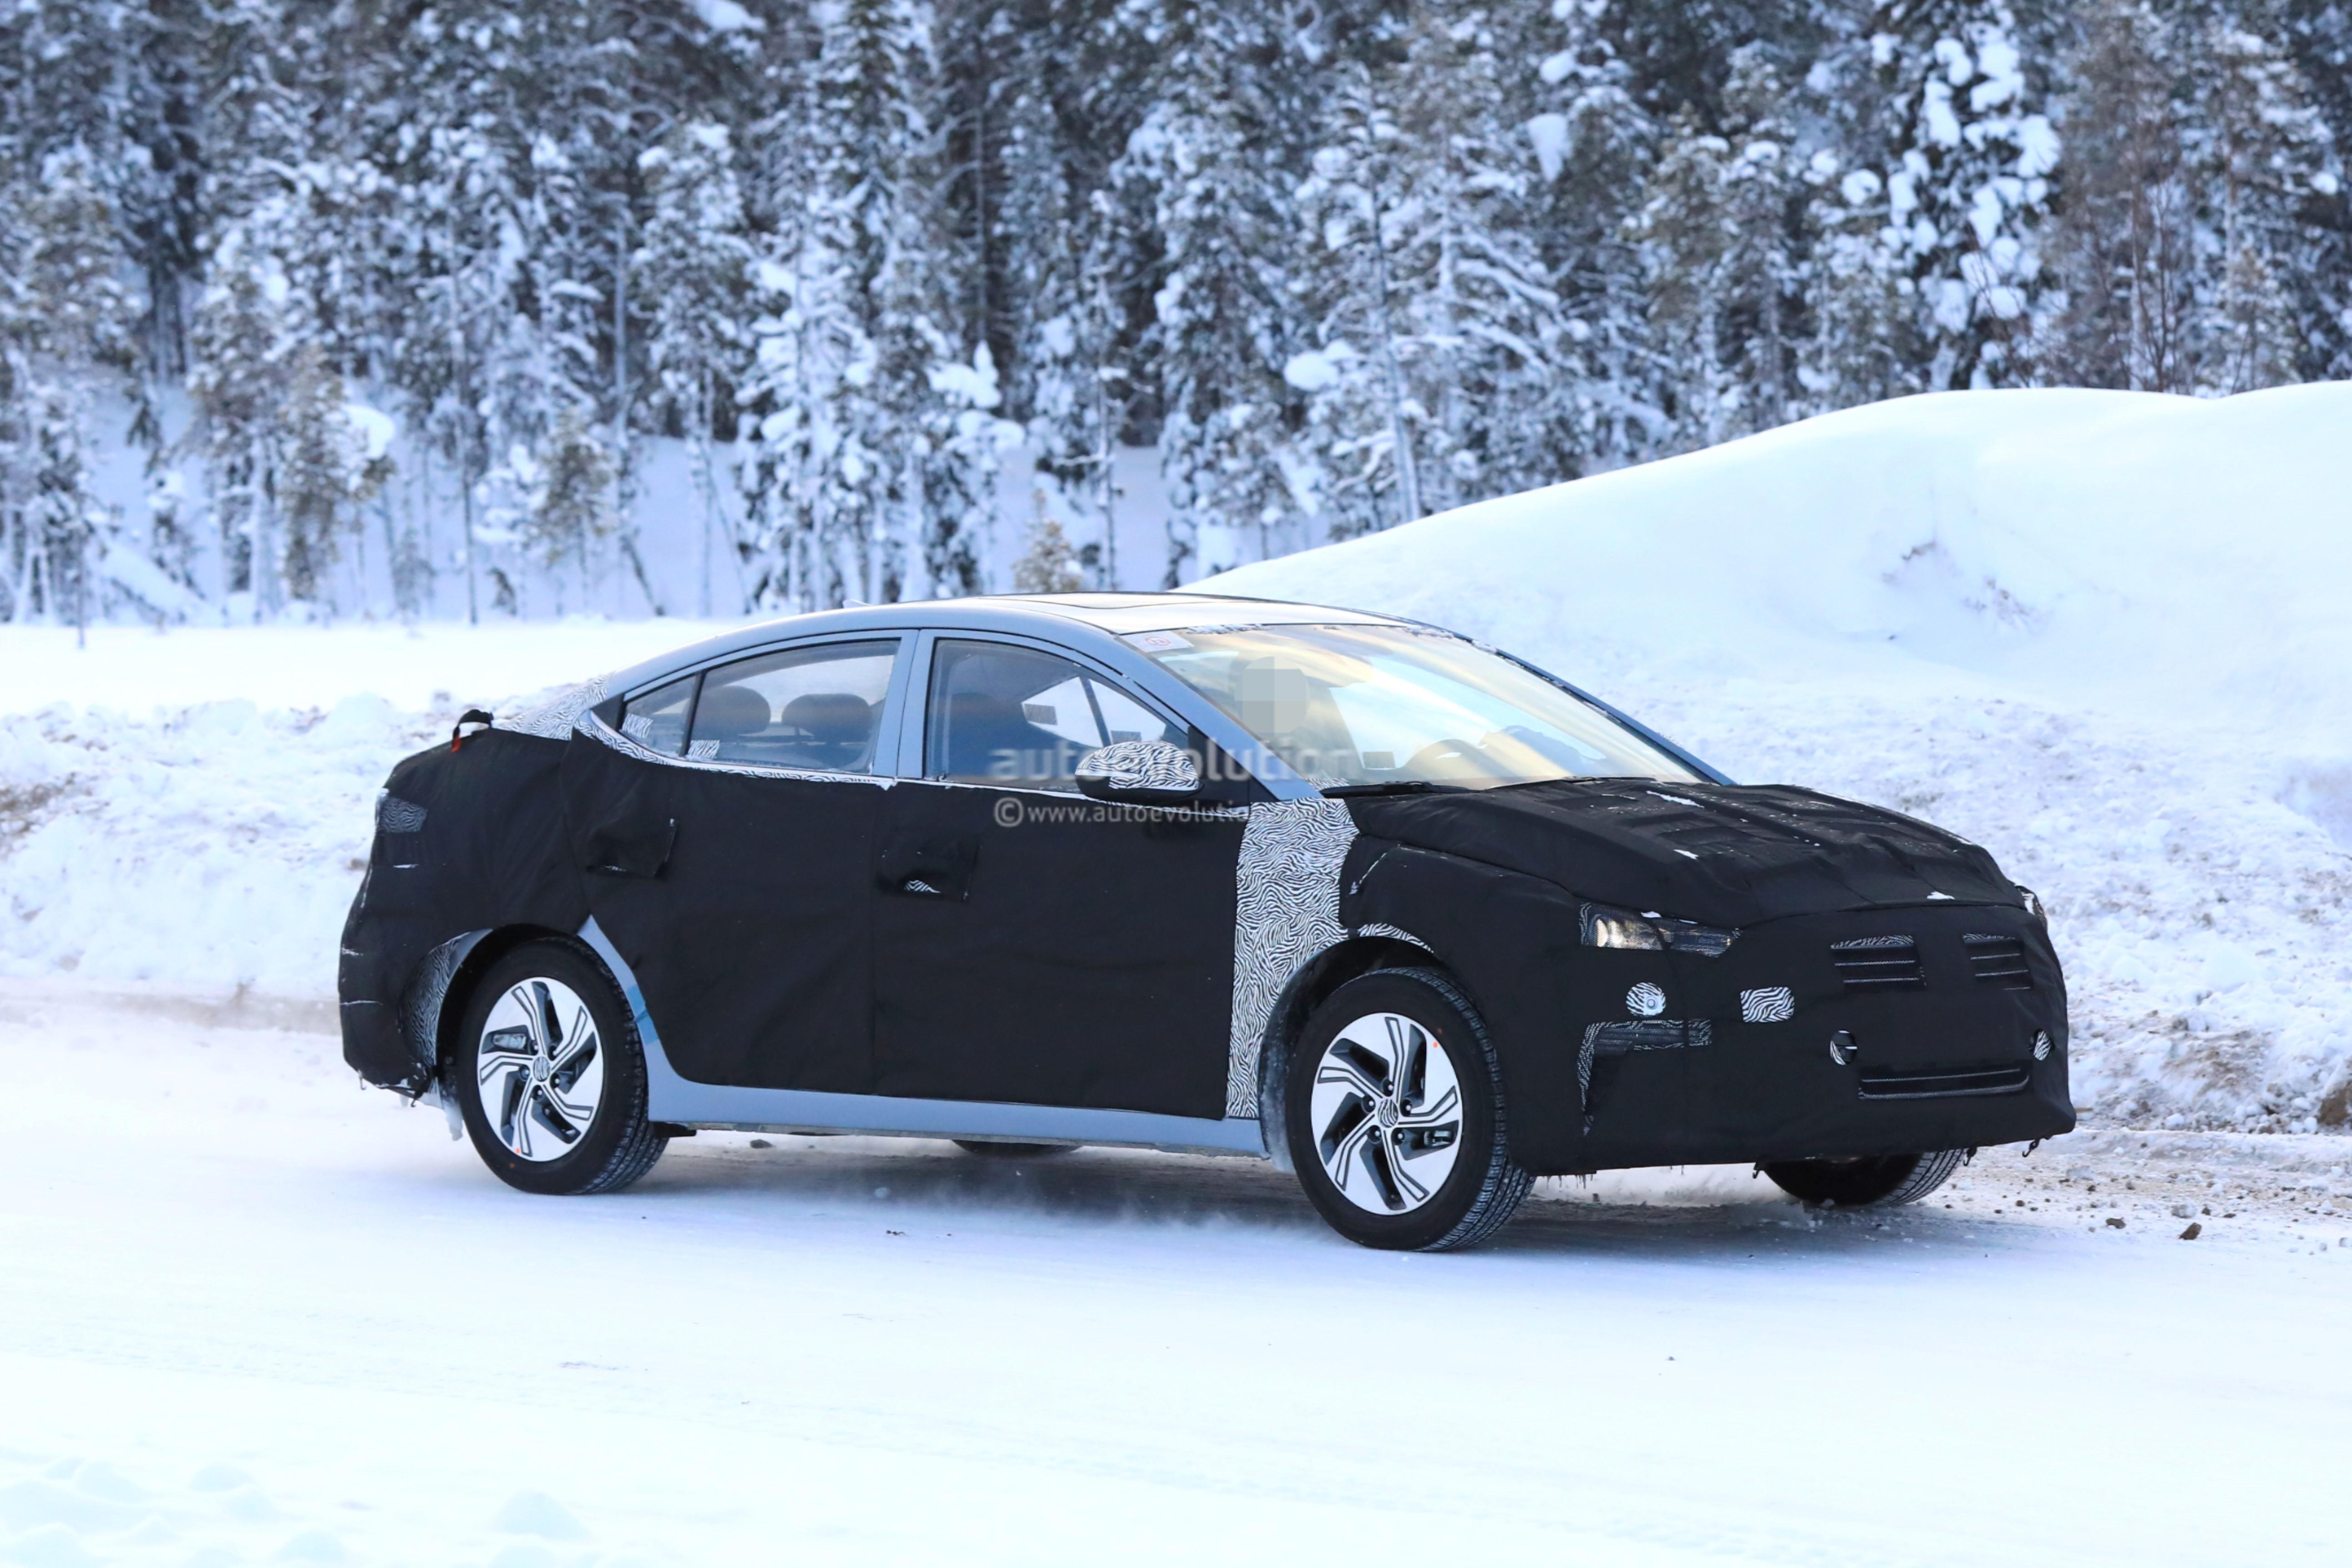 lease automatic in cars hyundai le canada price elantra a